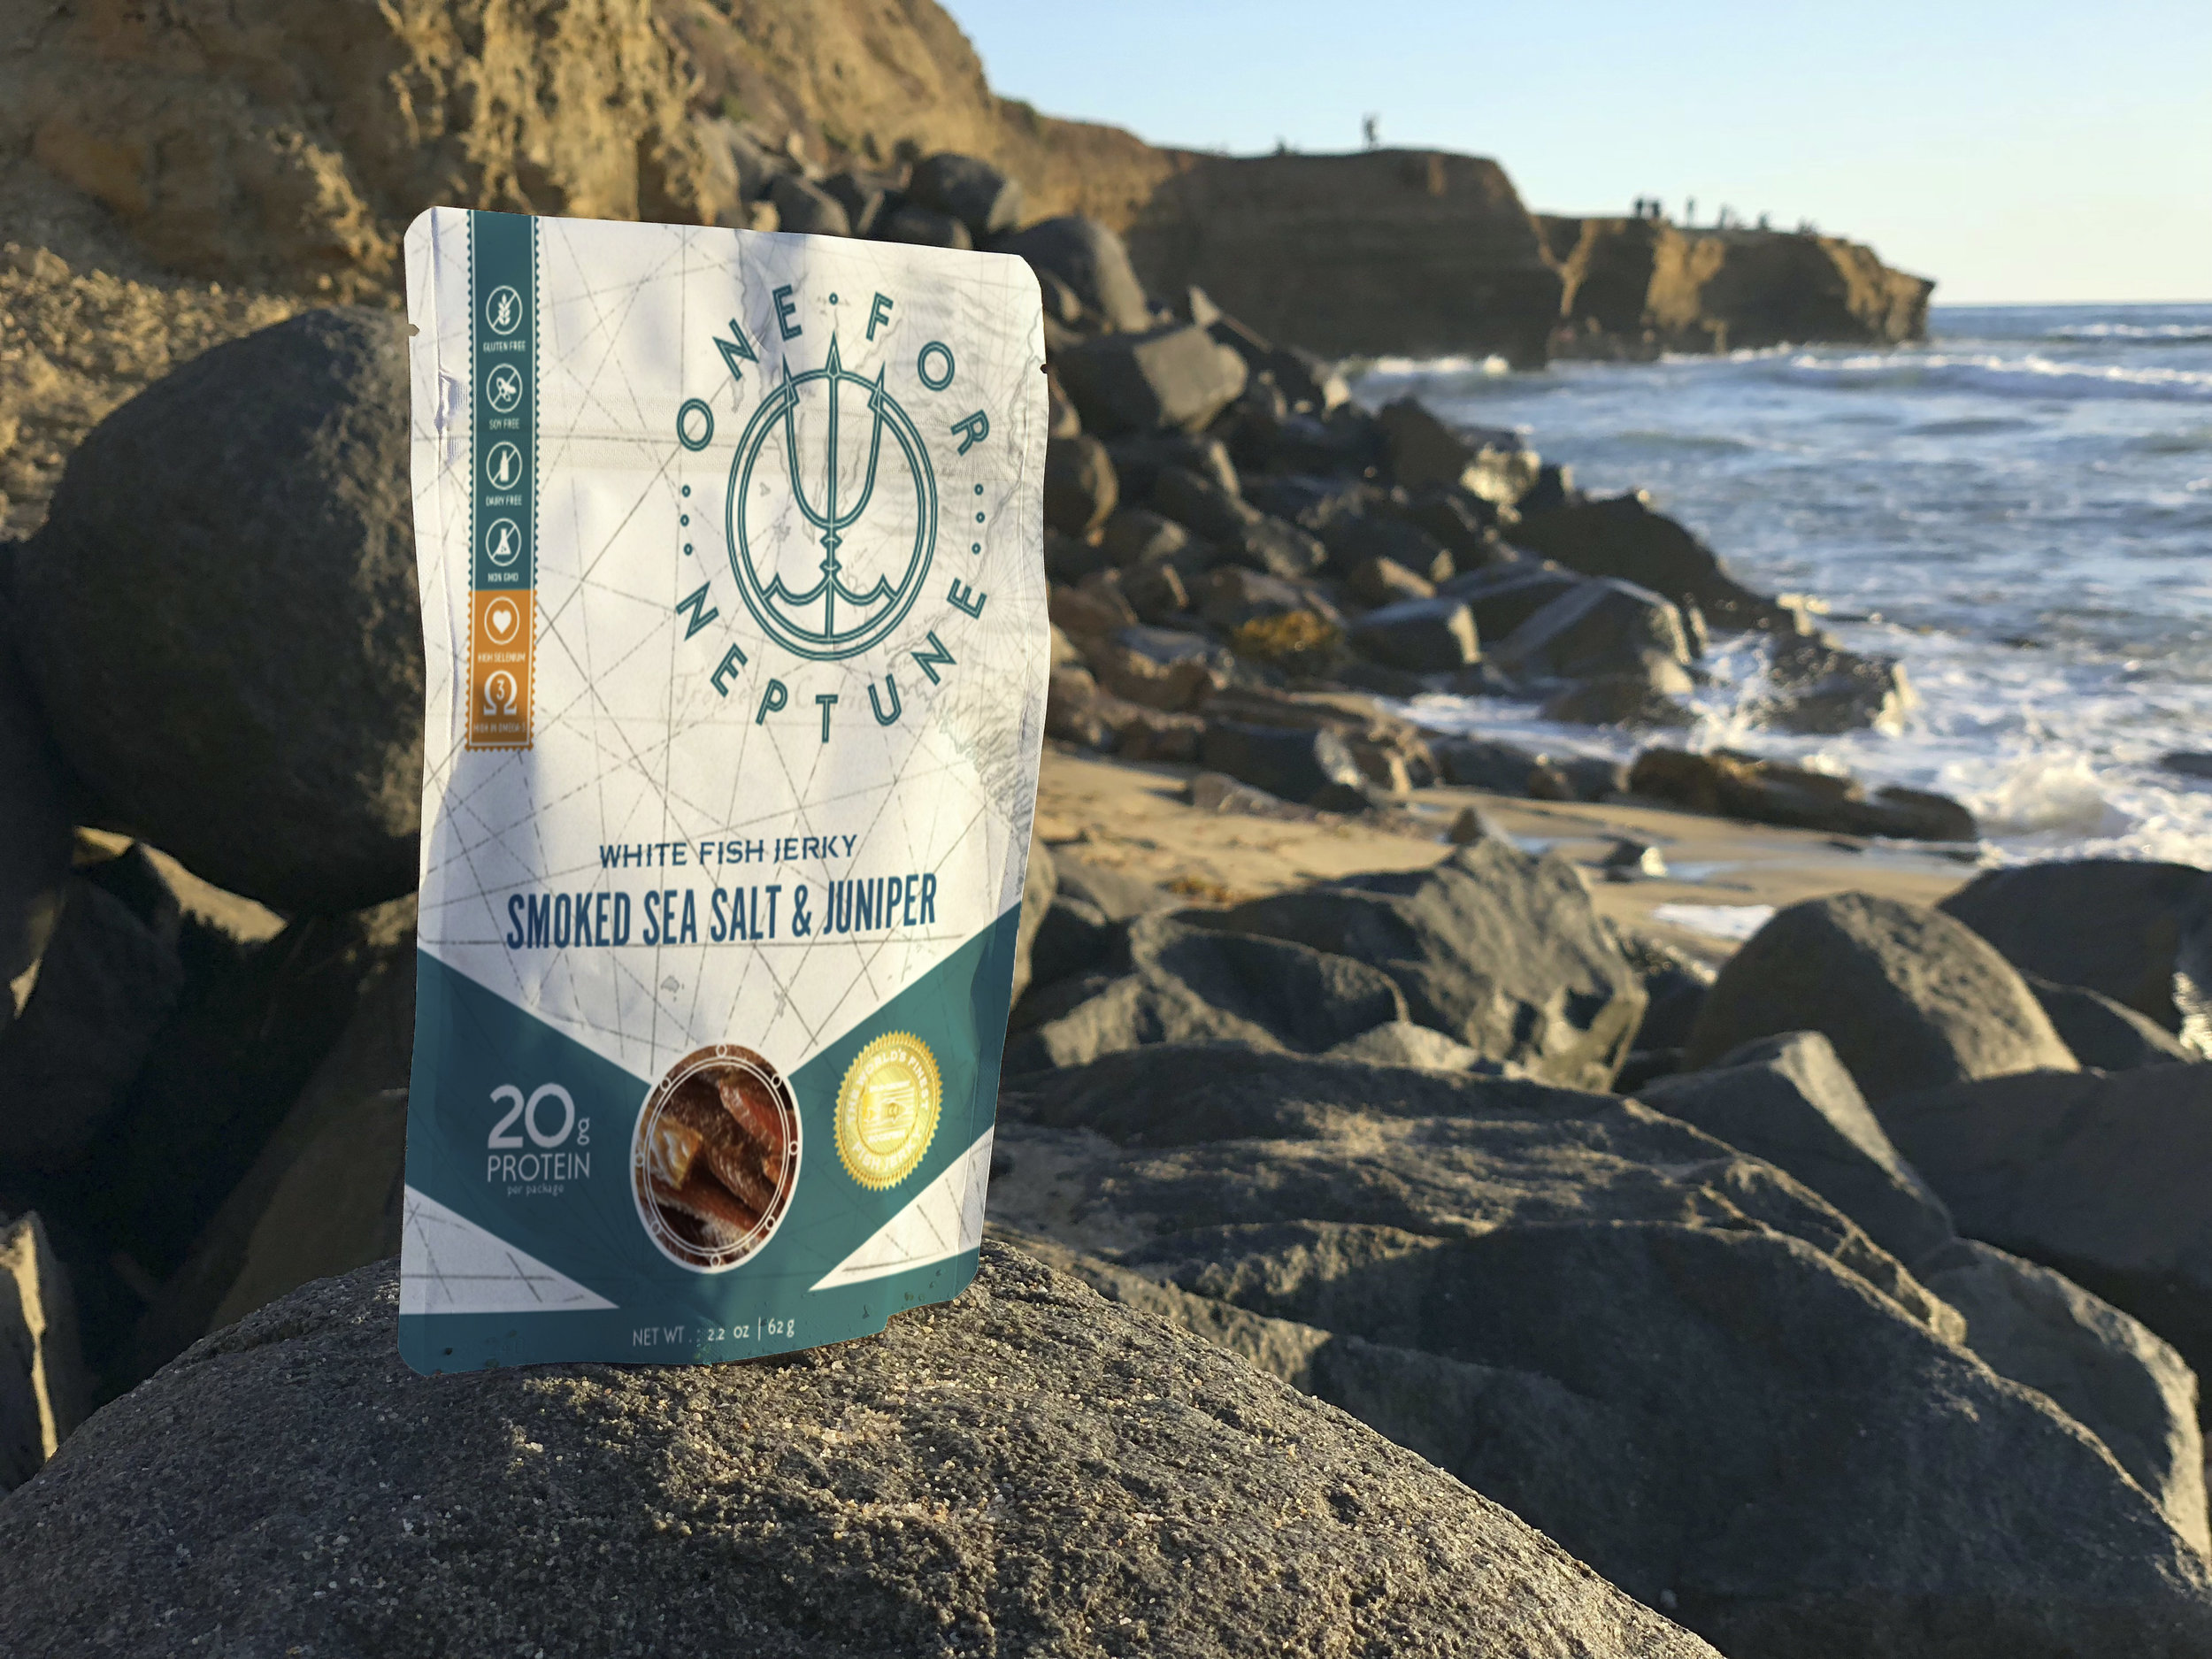 One For Neptune, Fish Jerky, Jerky Online, Keto Snacks, Gluten Free Snack Options, Online Farmers Market